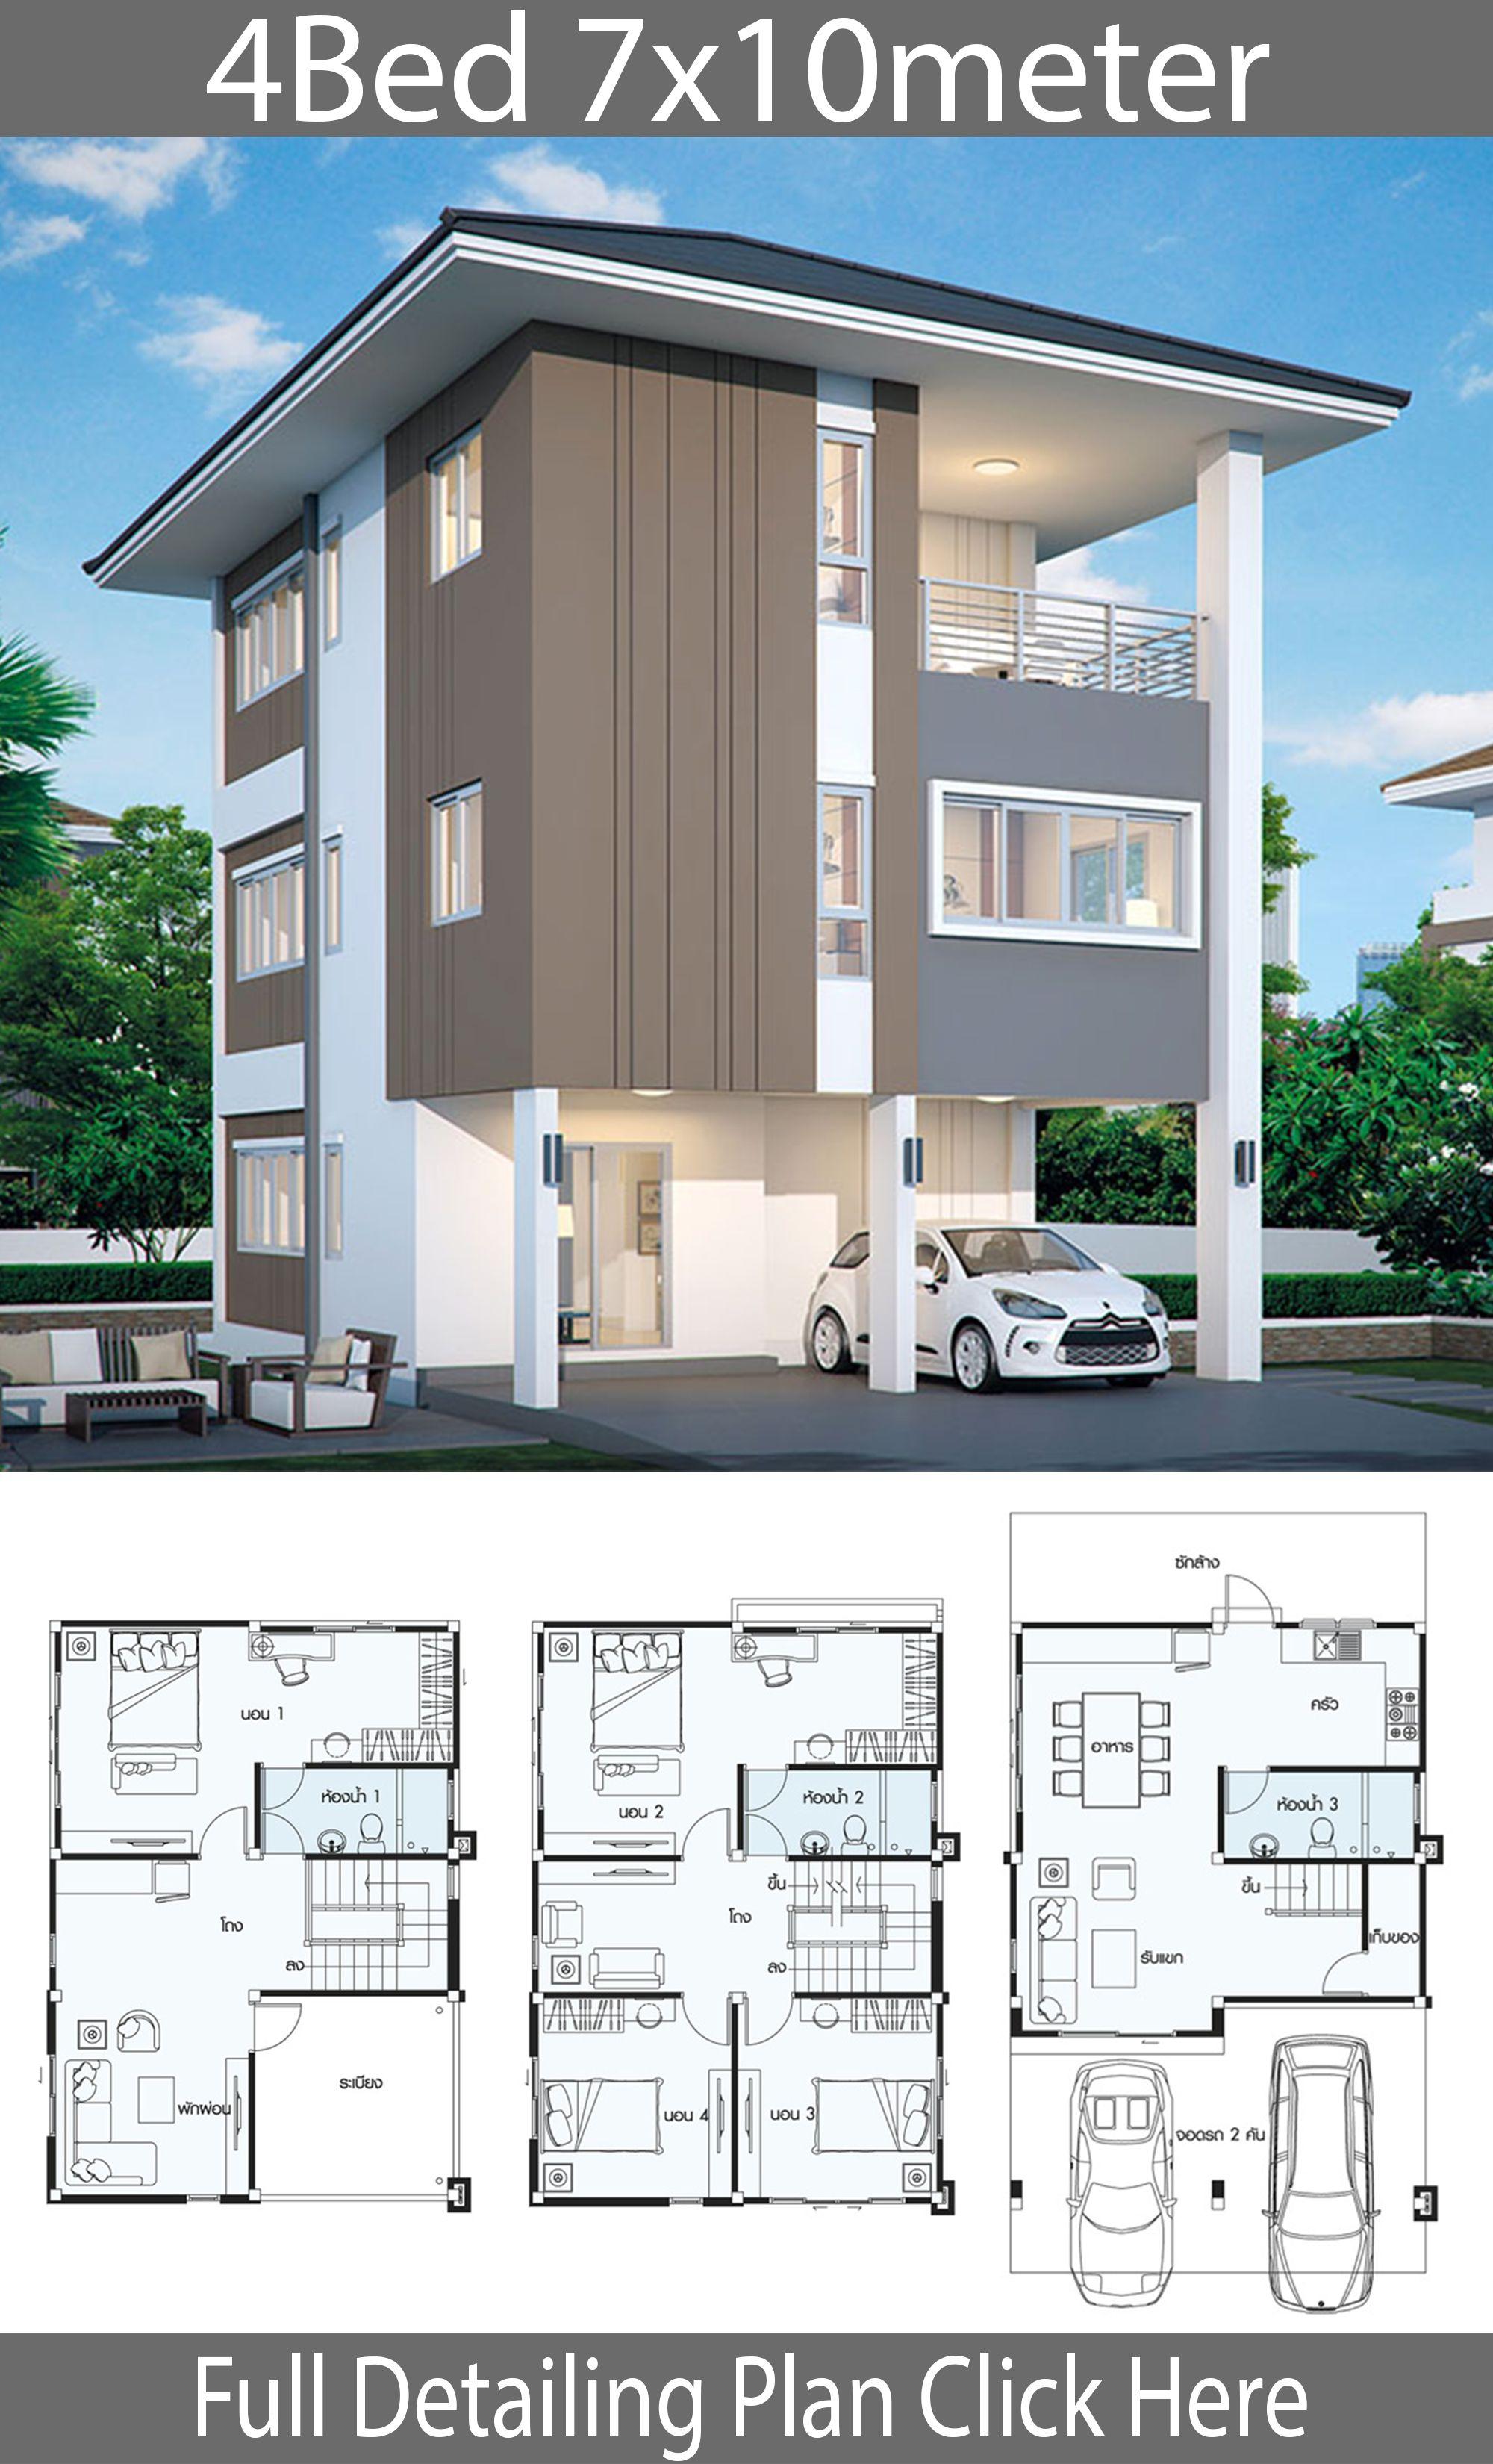 Home Design 7x10m With 4 Bedrooms House Idea House Architecture Design Home Design Plans Narrow Lot House Plans